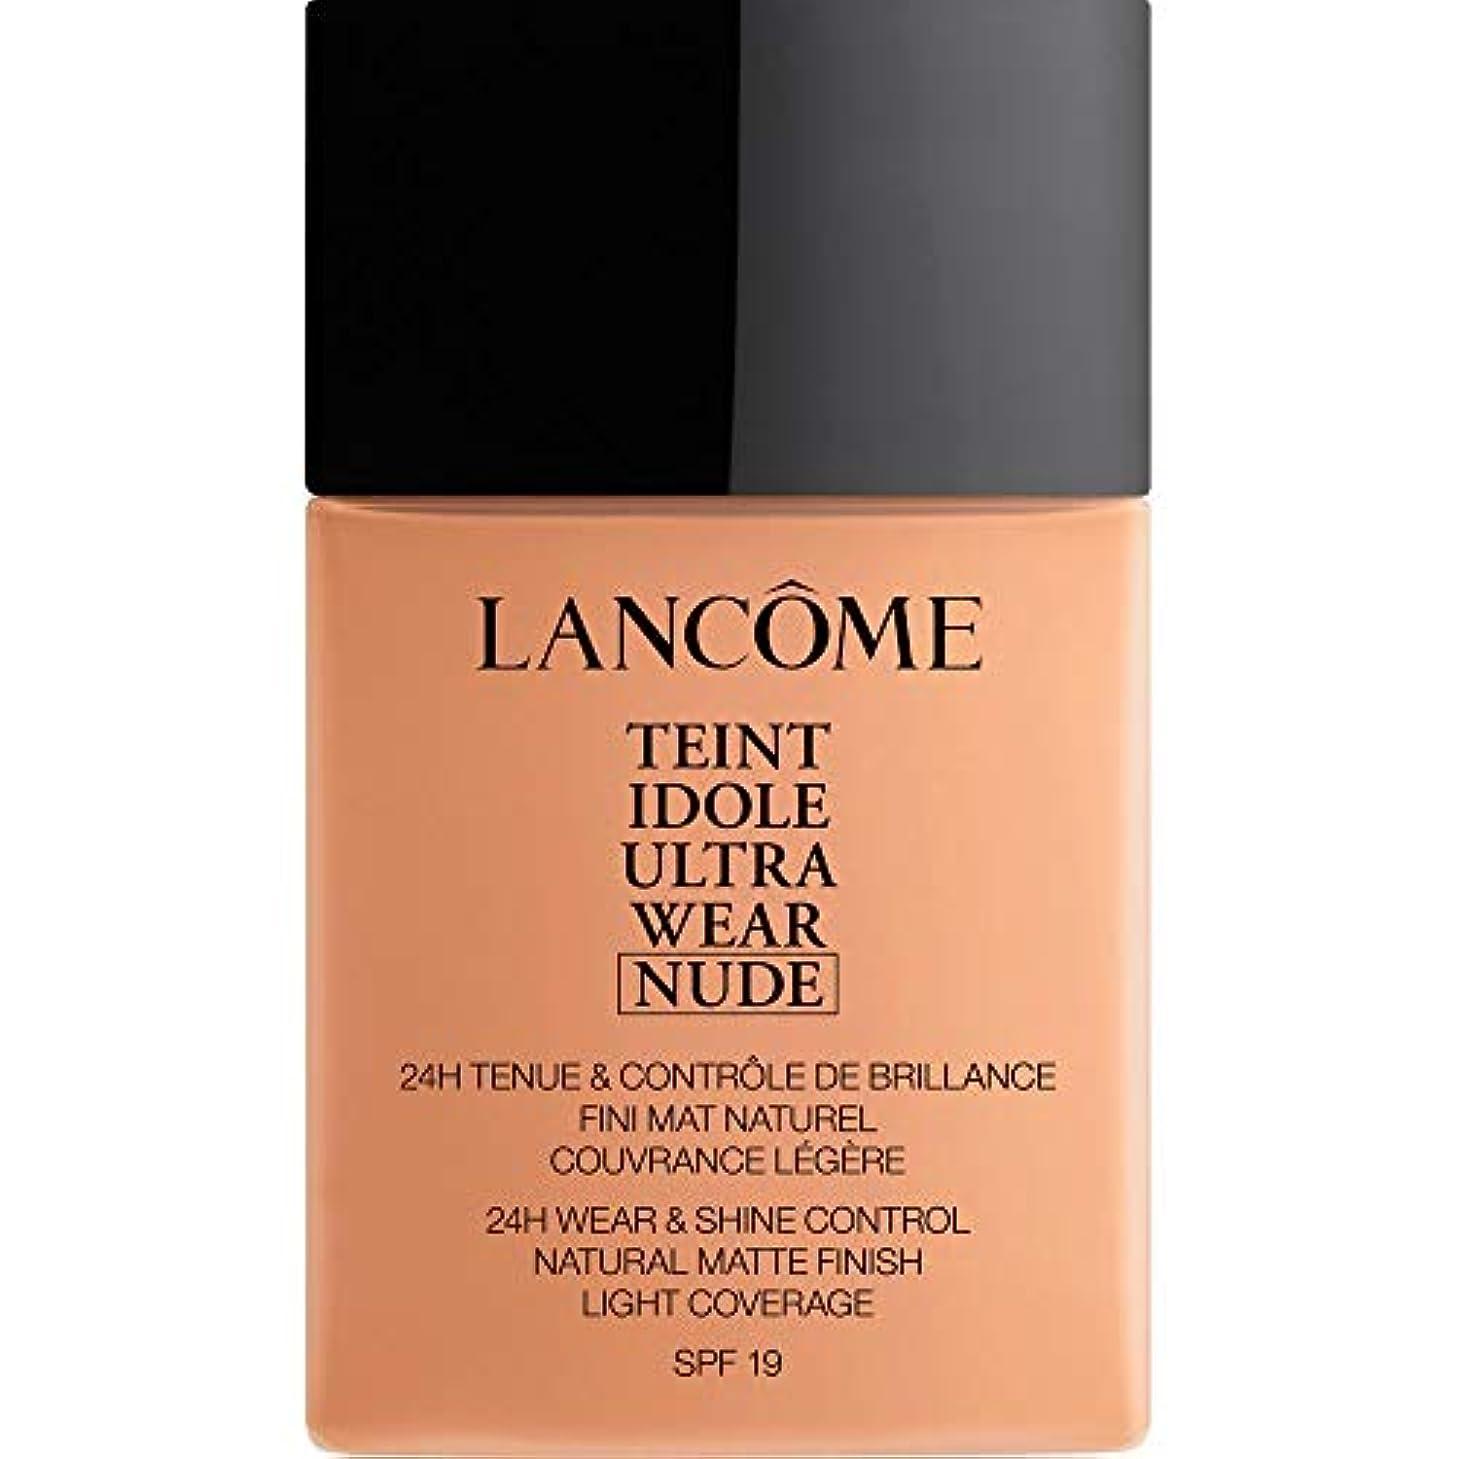 [Lanc?me ] ランコムTeintのIdole超摩耗ヌード財団Spf19の40ミリリットル048 - ベージュChataigne - Lancome Teint Idole Ultra Wear Nude Foundation...